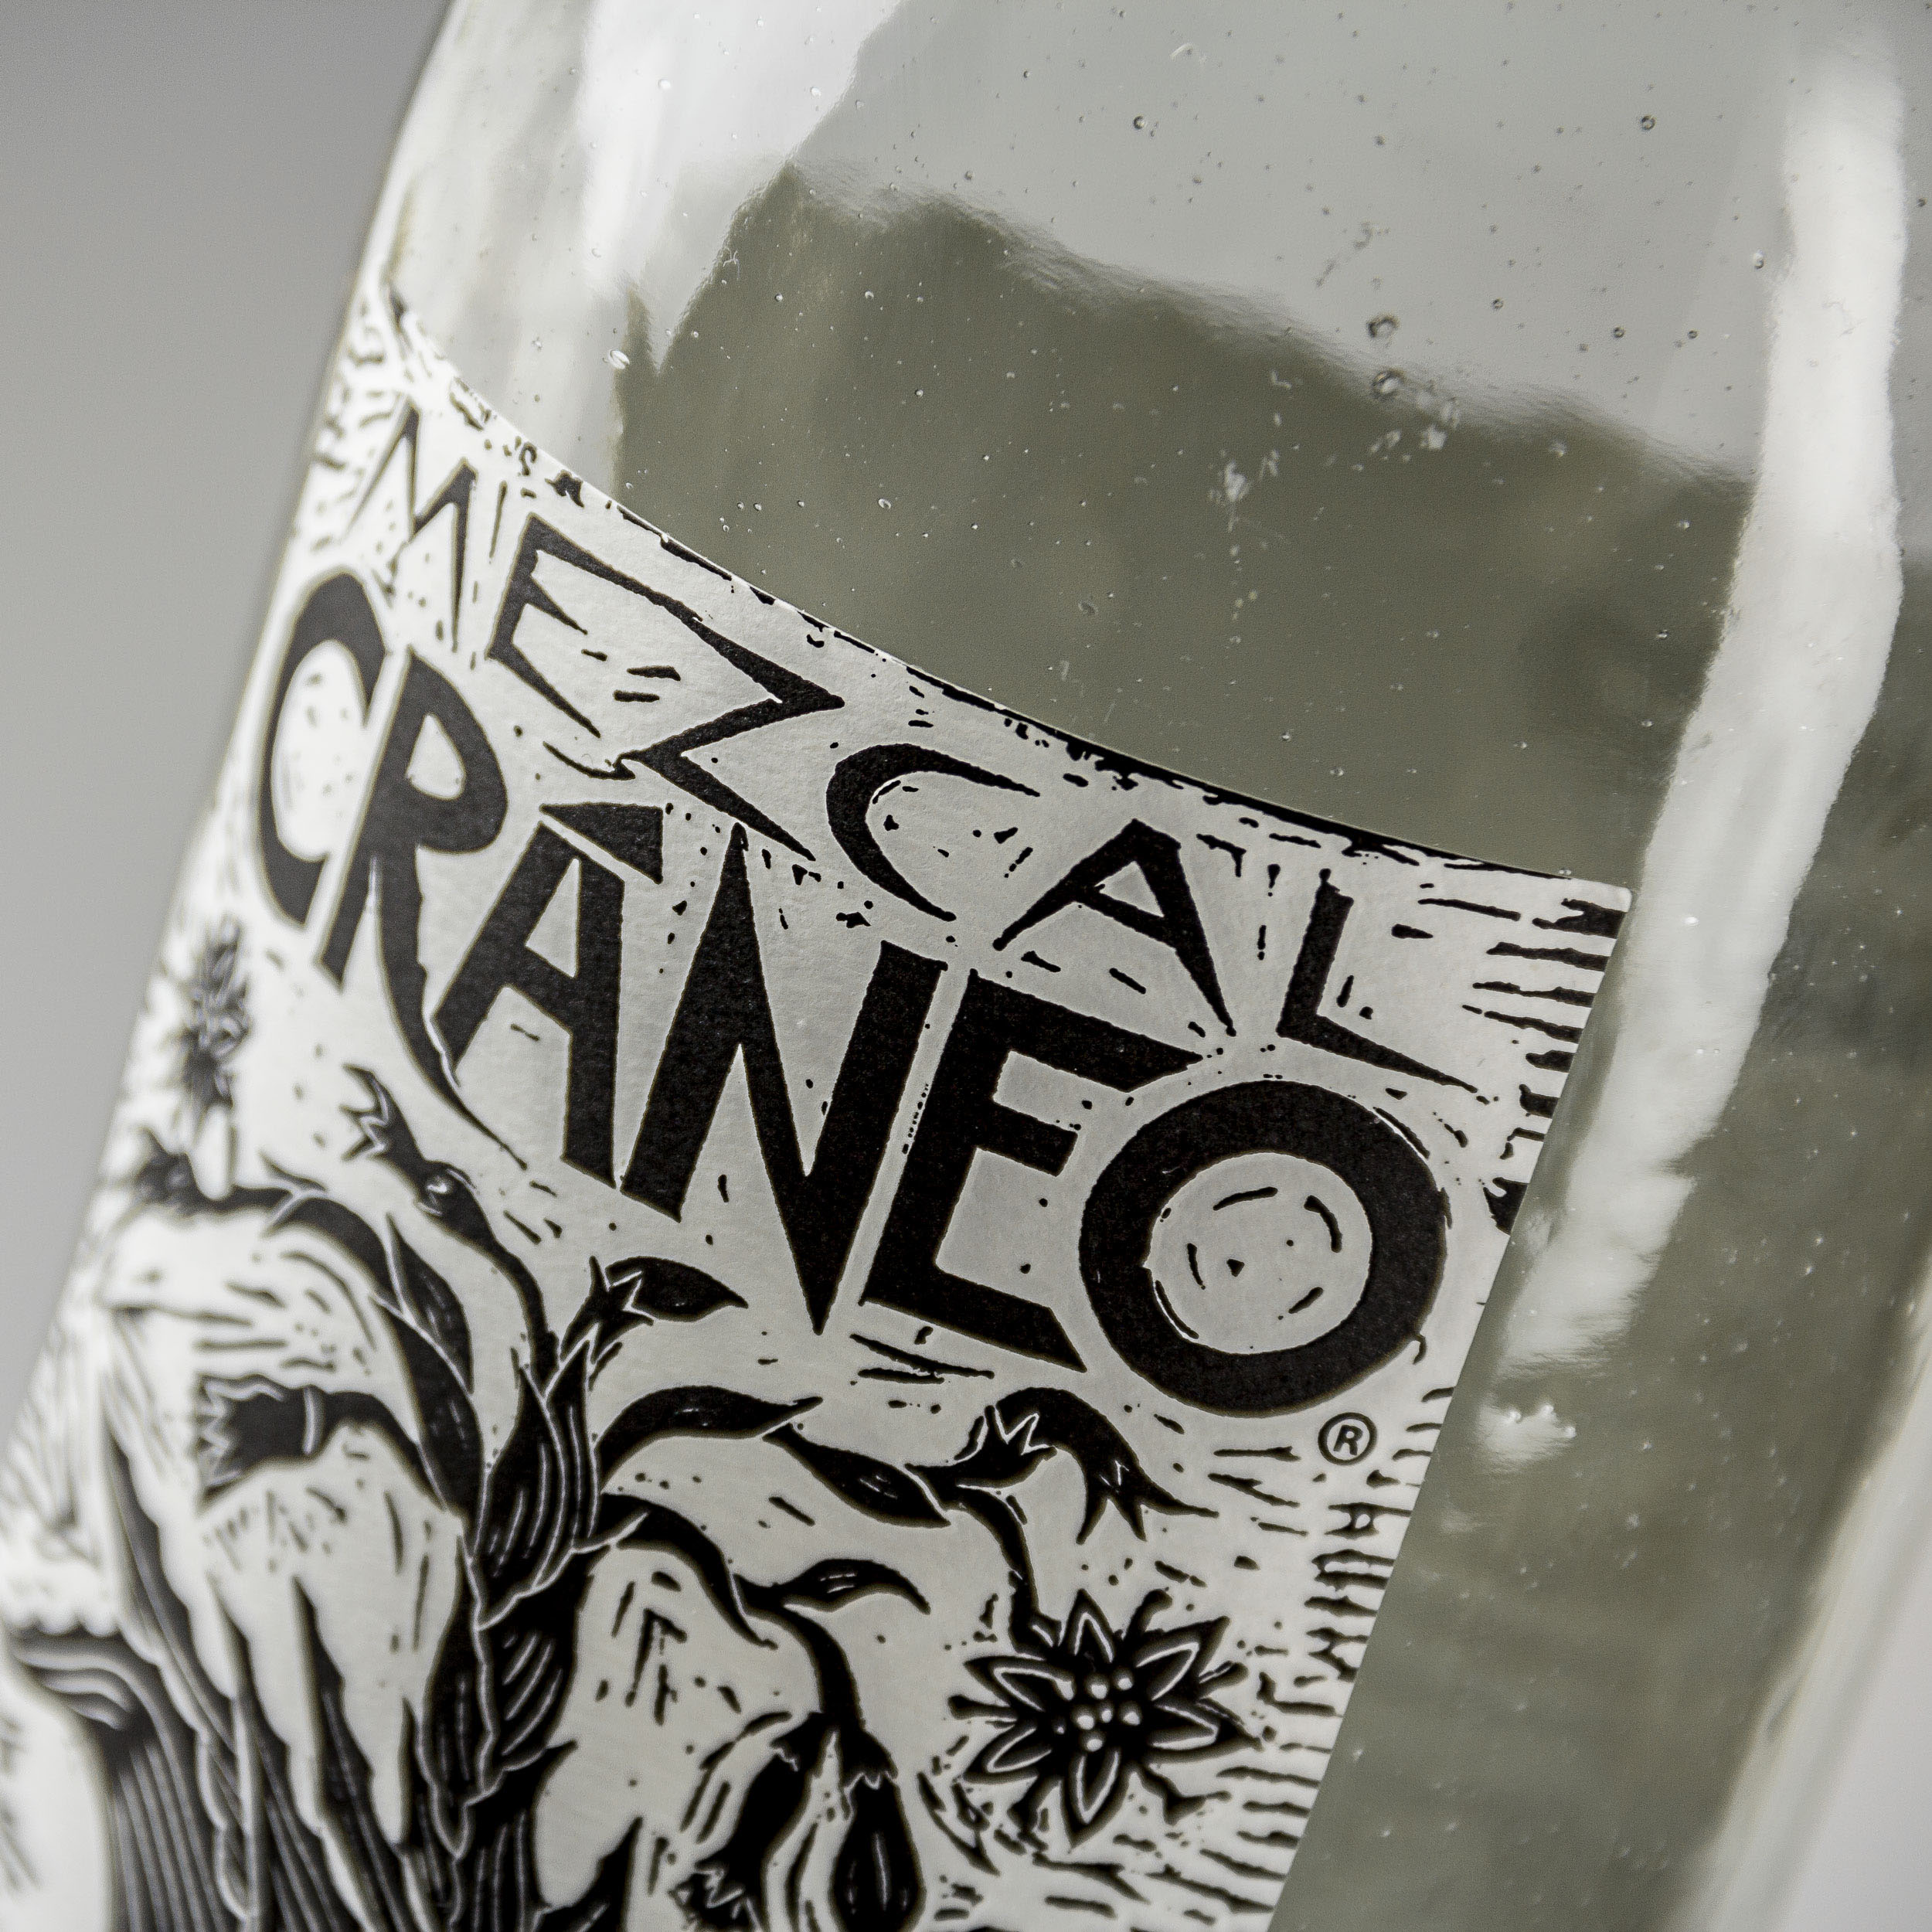 Cráneo Organic Mezcal可持续包装设计